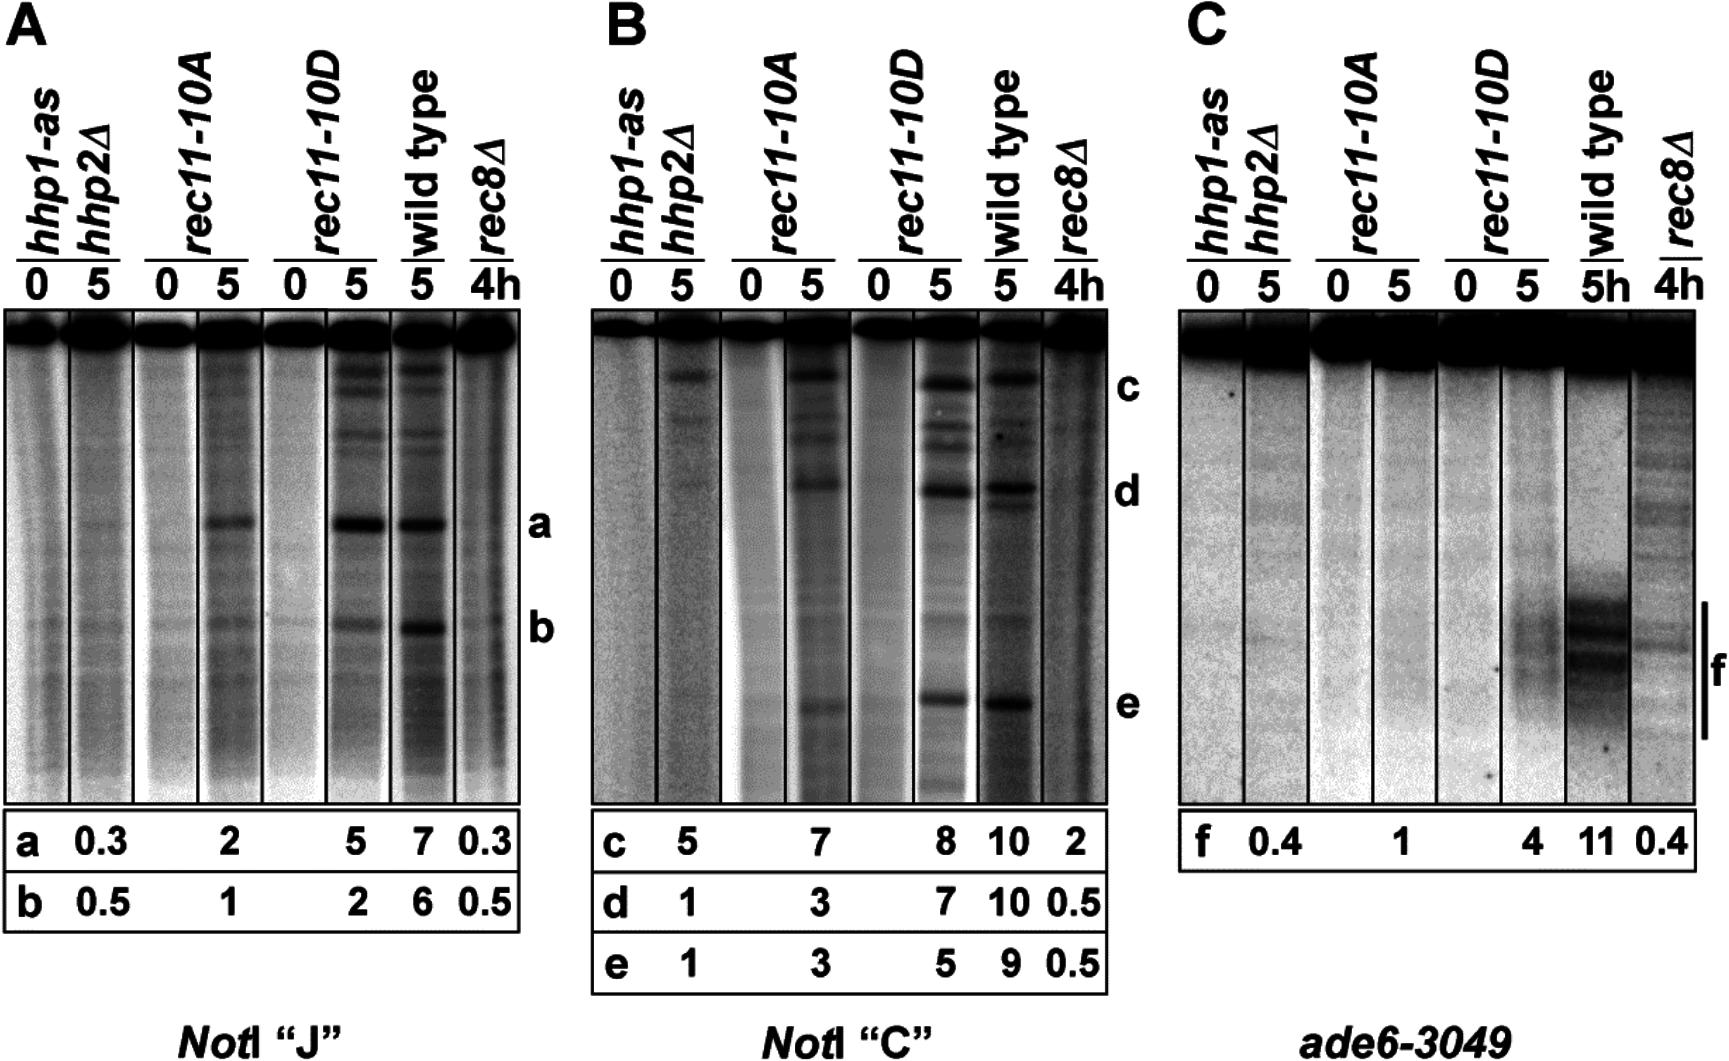 Meiotic DNA breakage in <i>hhp</i>, <i>rec11</i>, and <i>rec8</i> mutants.